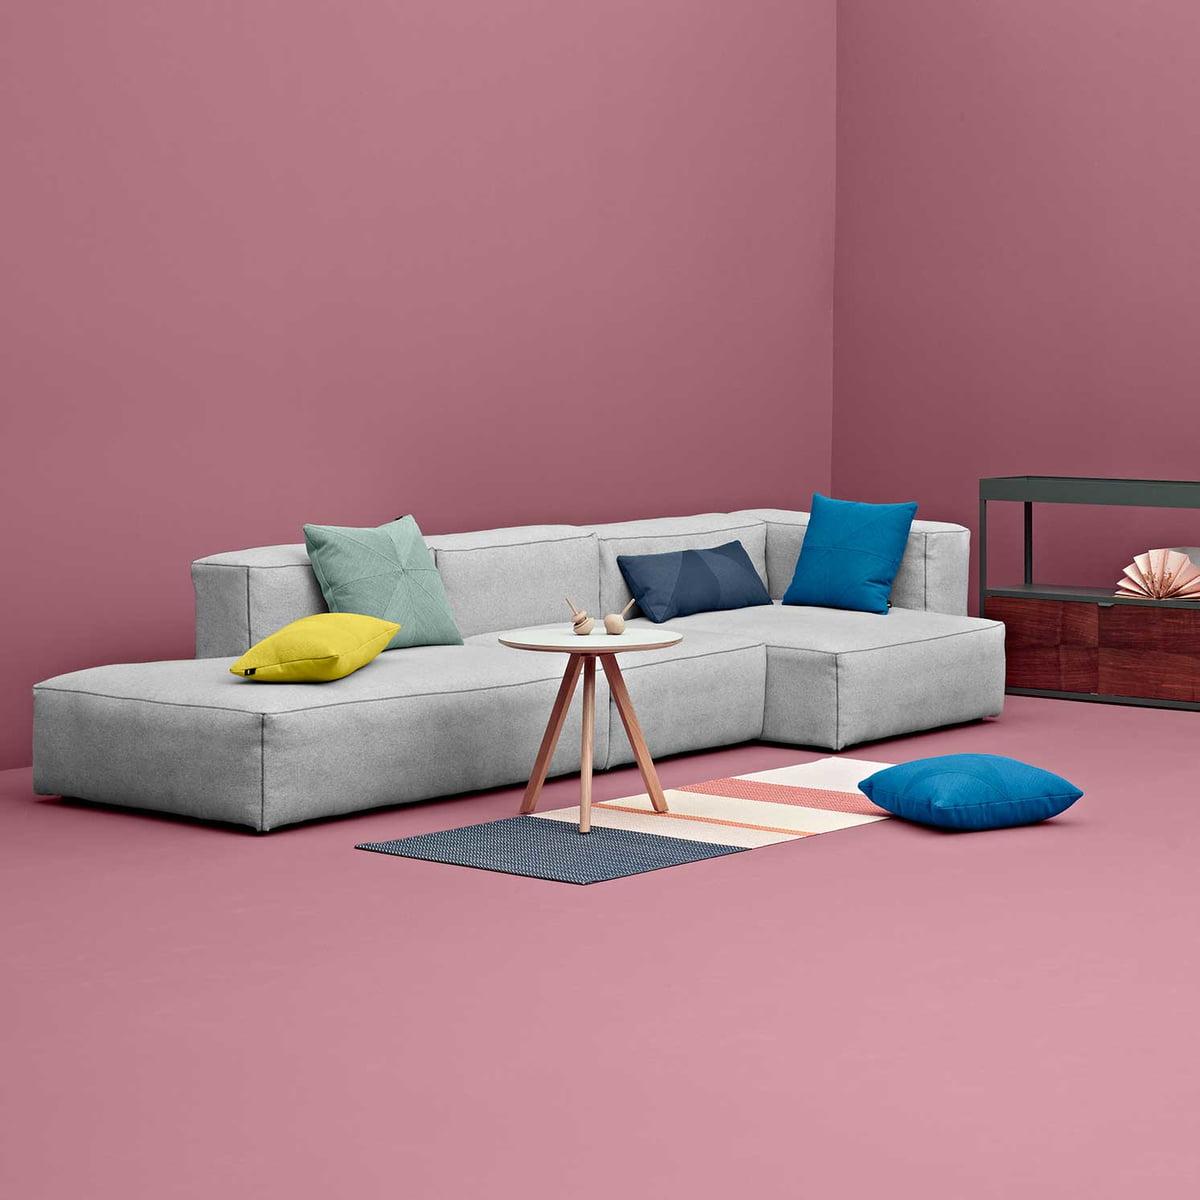 hay mags sofa kaufen refil sofa. Black Bedroom Furniture Sets. Home Design Ideas